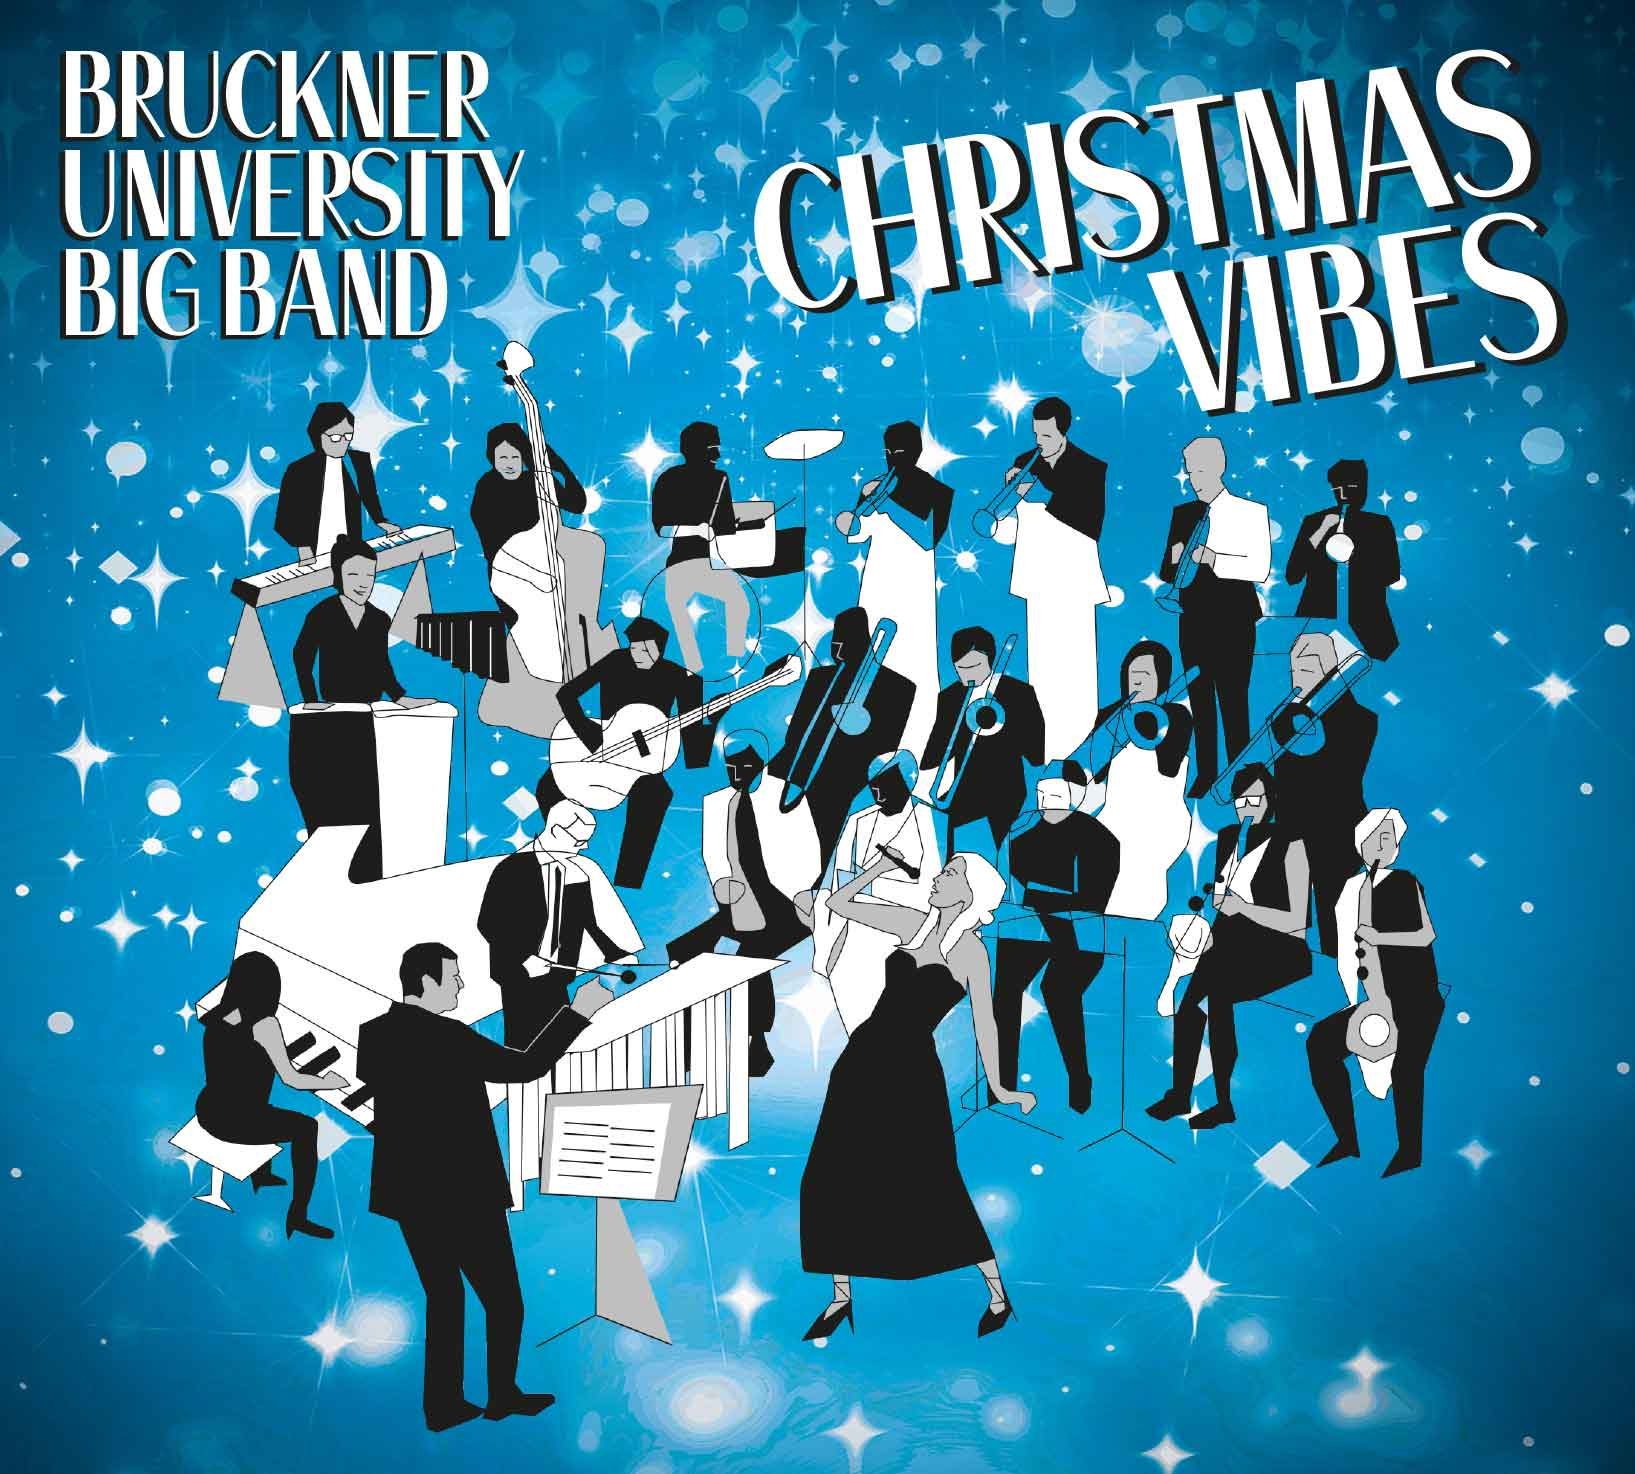 CD Bruckner University Big Band Christmas Vibes